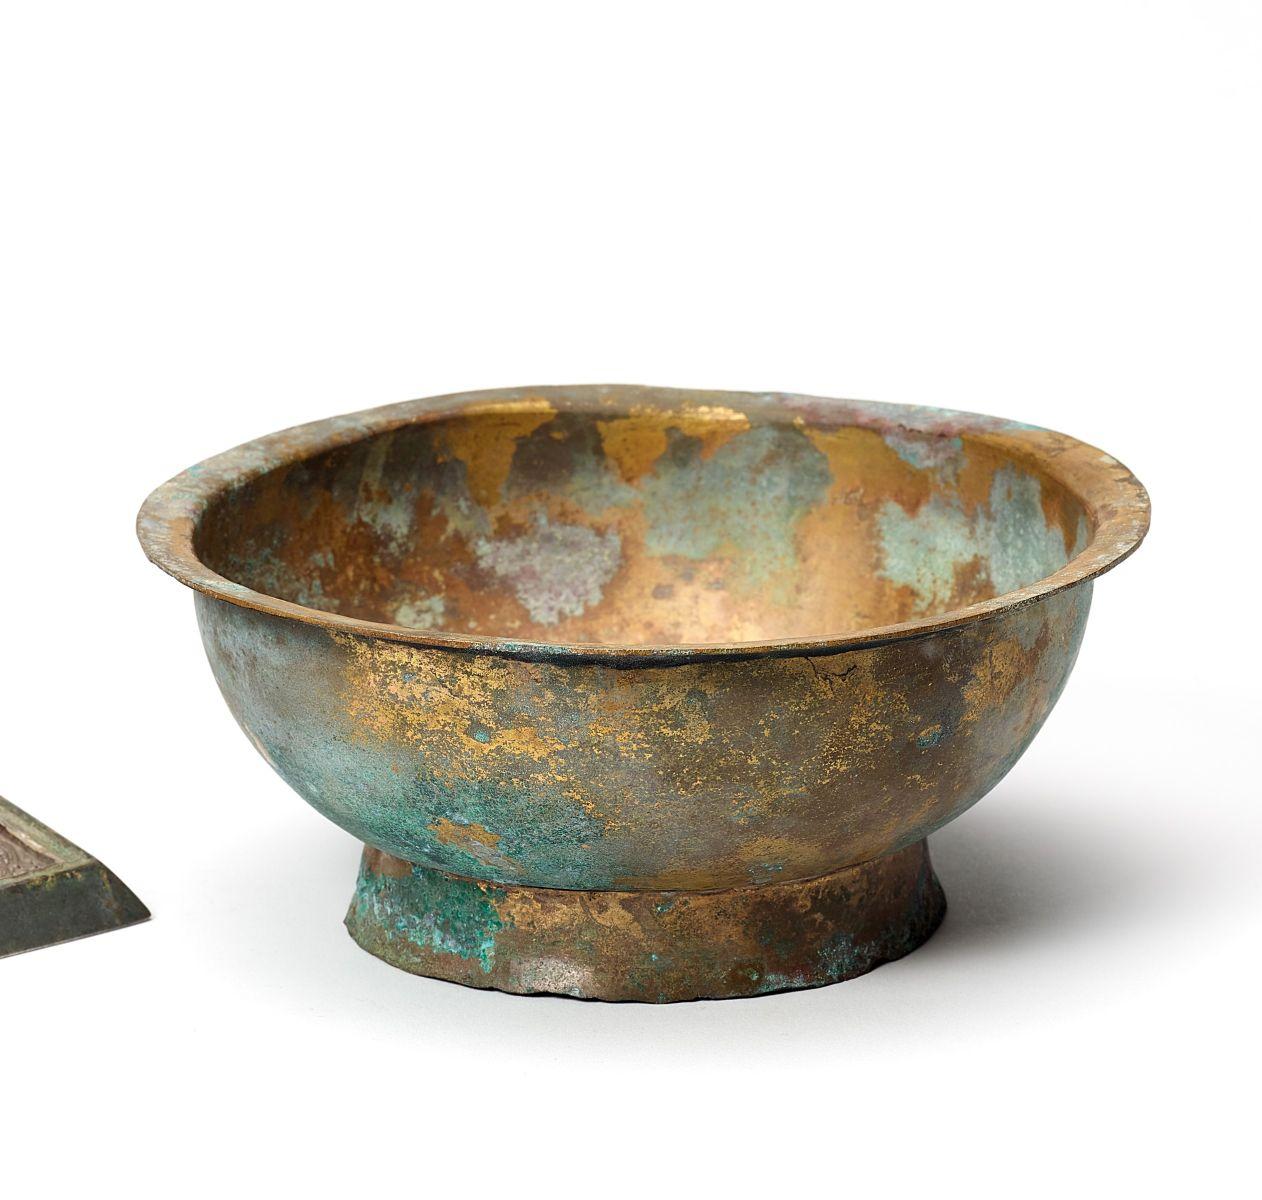 #83 1 Bronze Objects   1 Bronzeobjekt Image